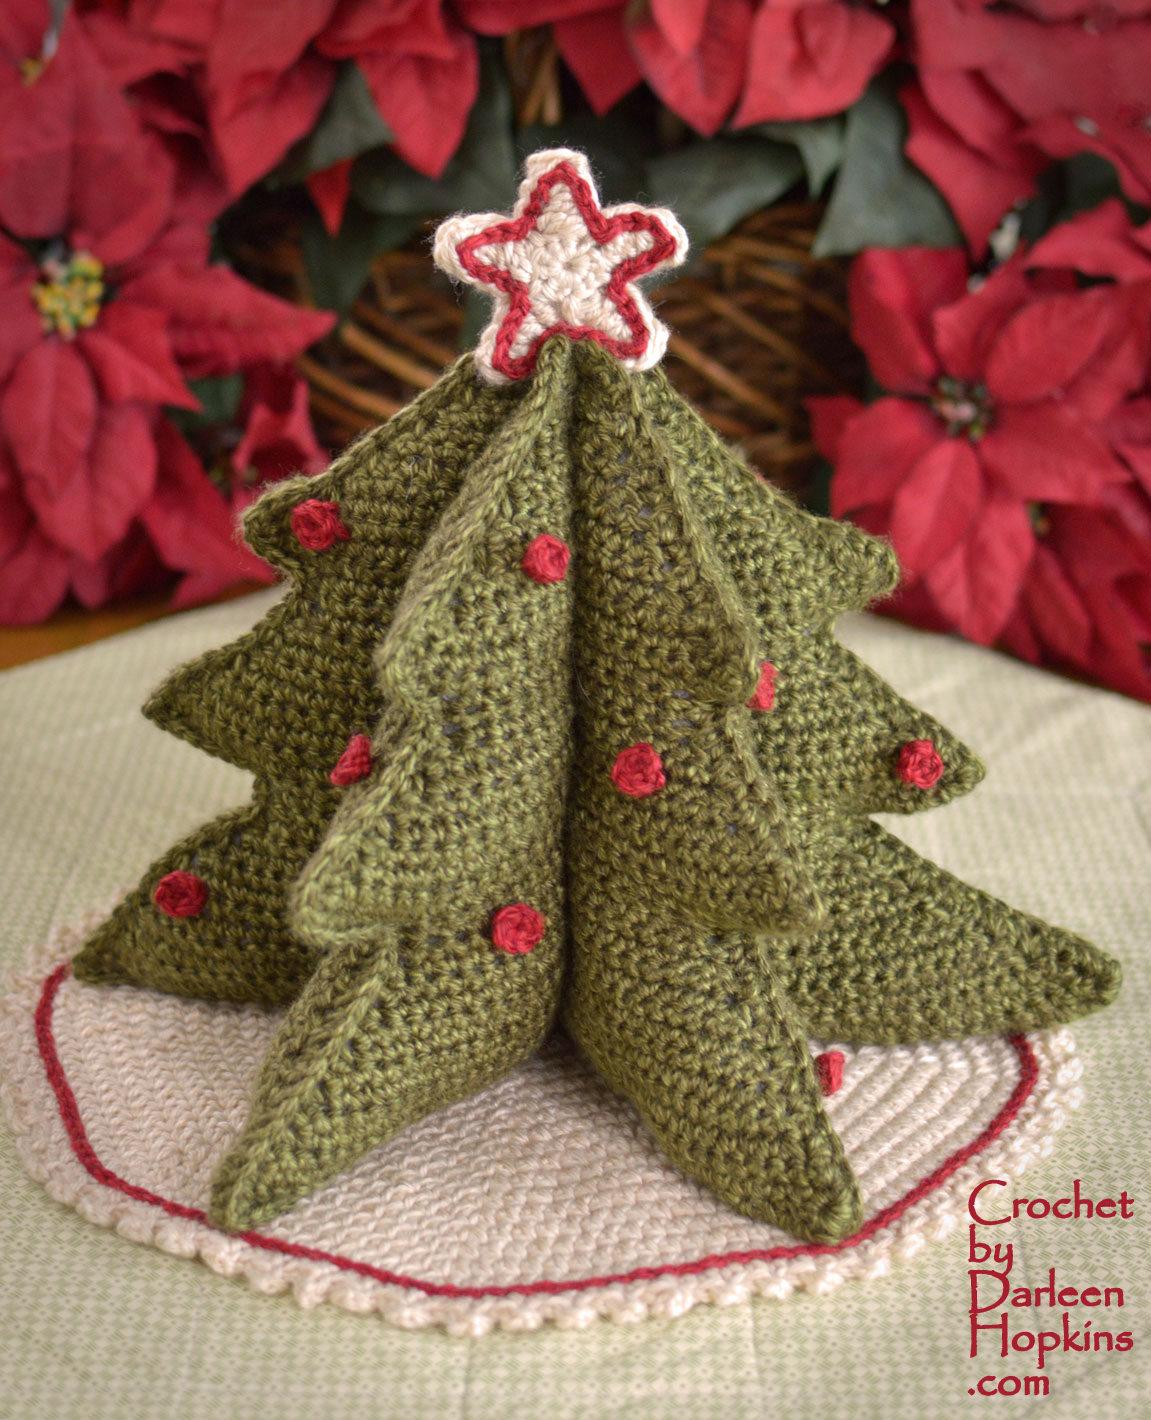 Christmas Tree Centerpiece | Crochet By Darleen Hopkins